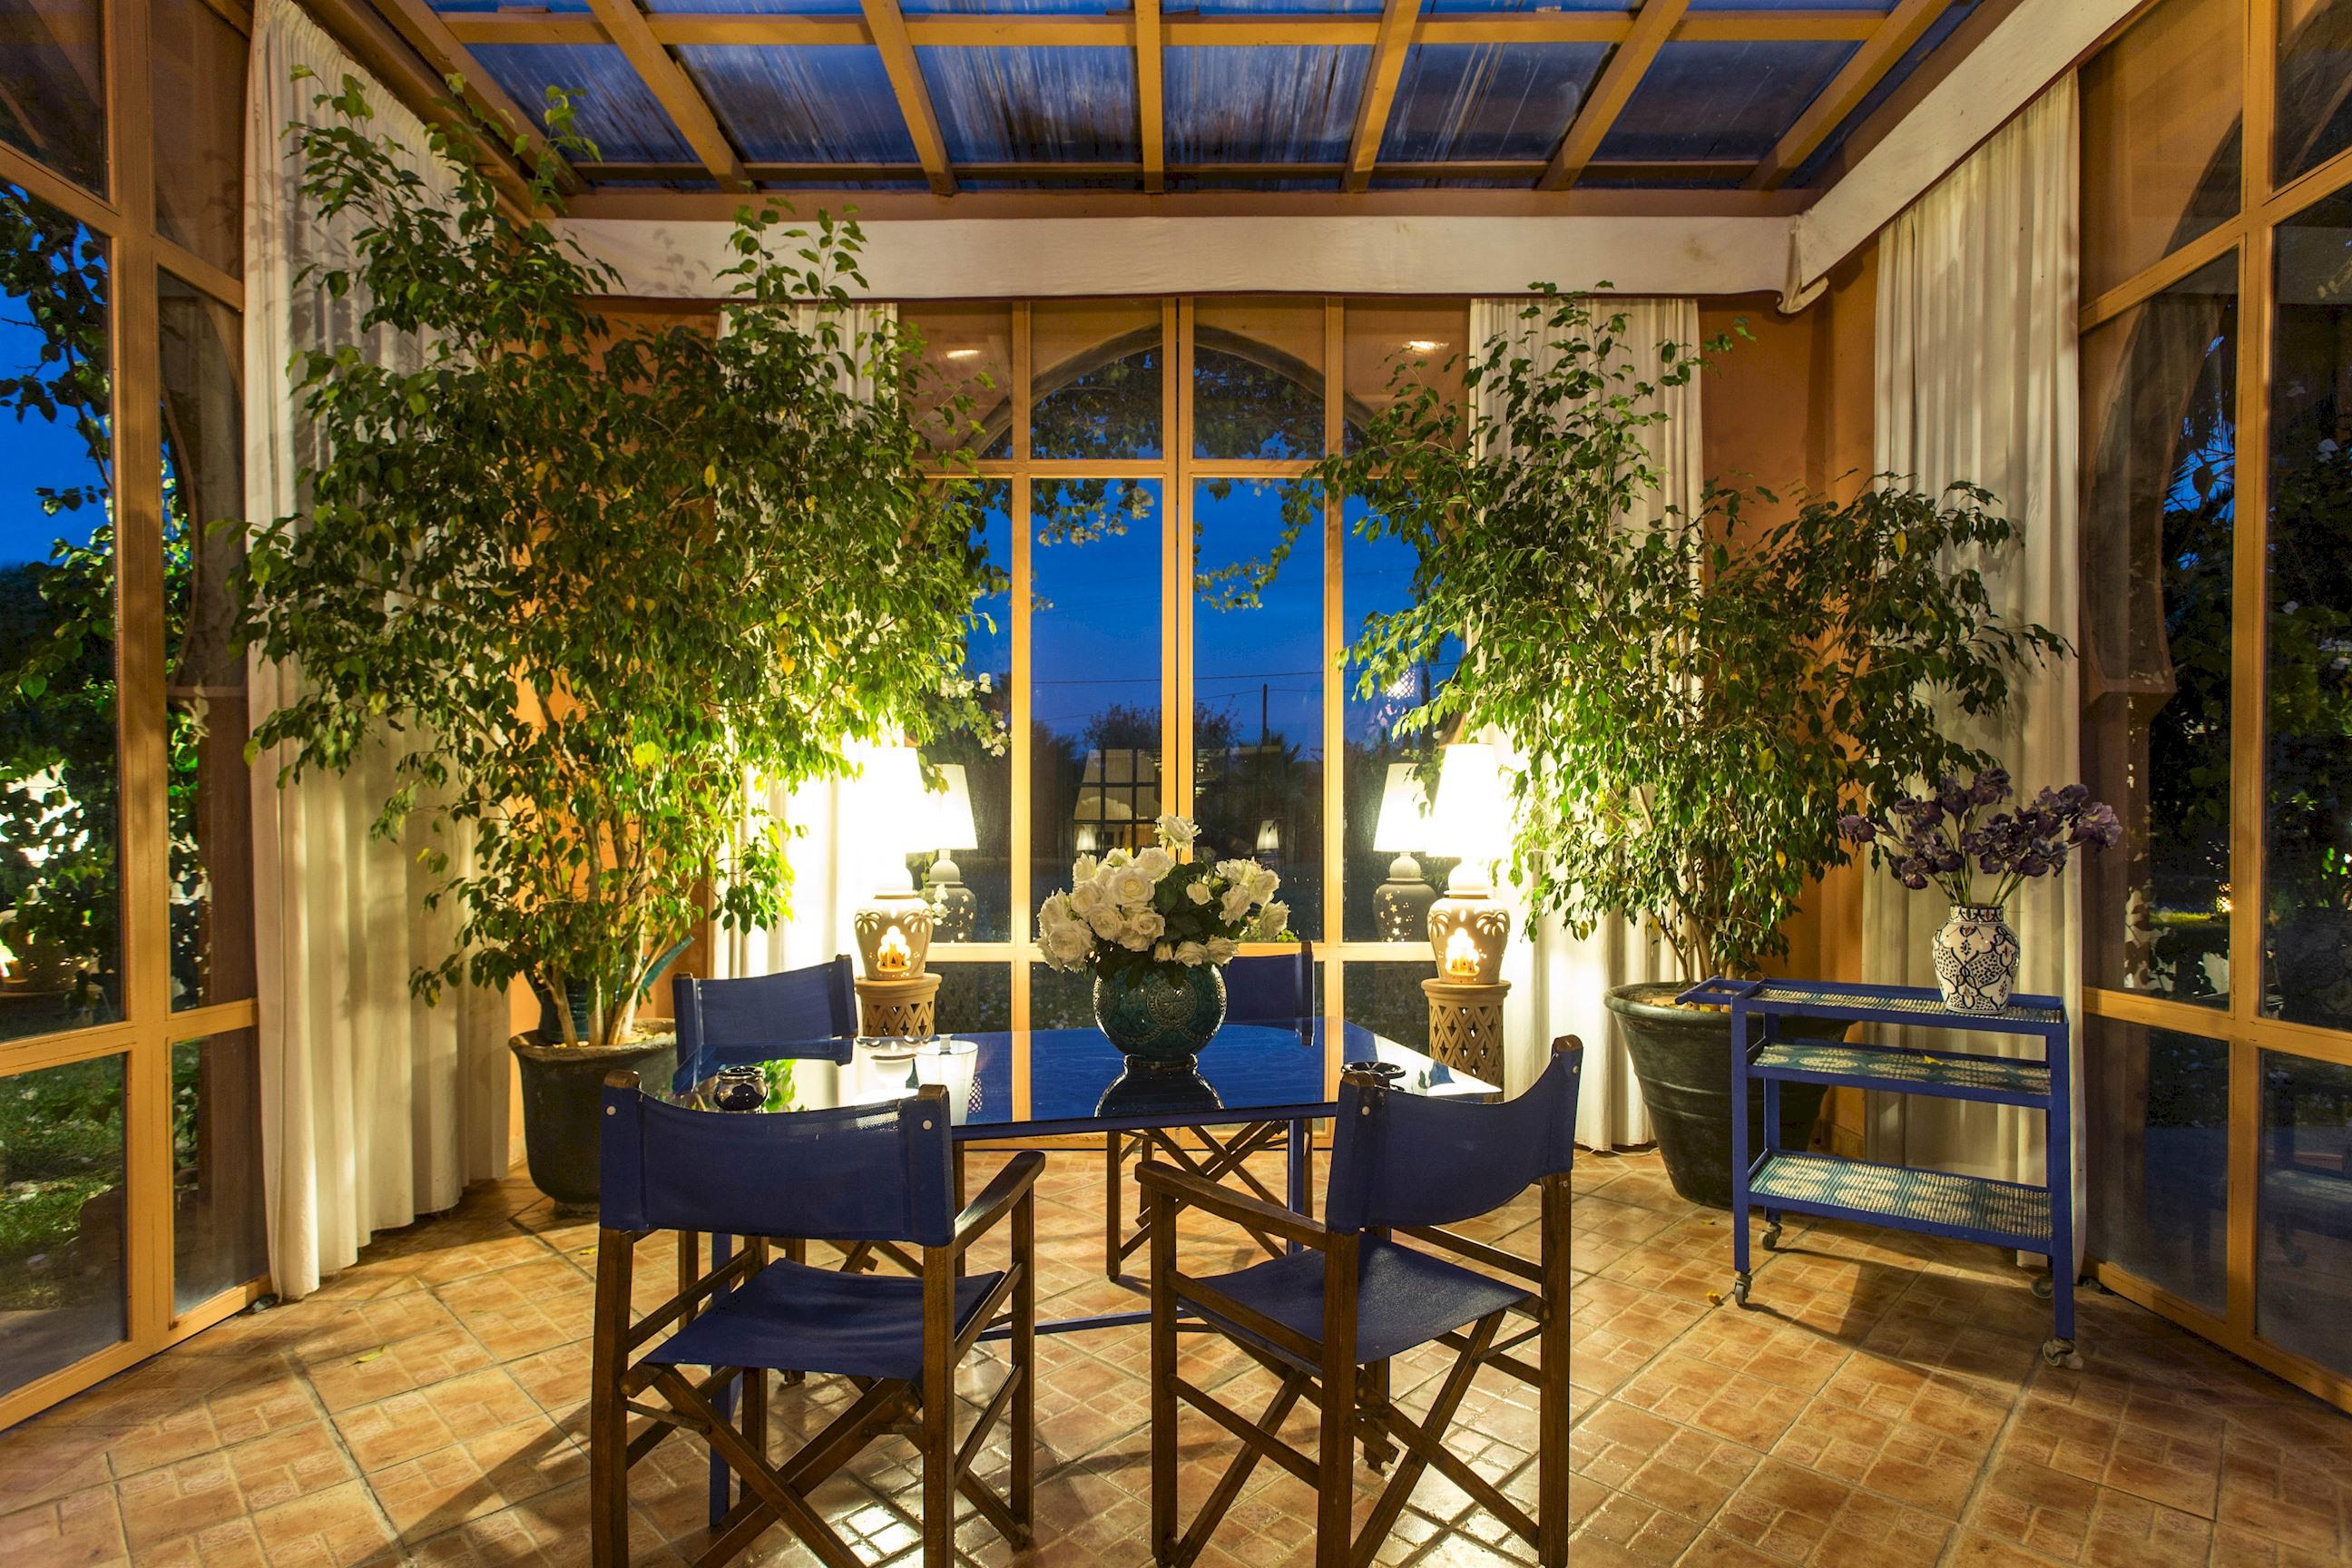 Apartment VILLA LES OLIVIERS - SPLENDIDE VILLA AVEC PISCINE A MARRAKECH photo 16754000